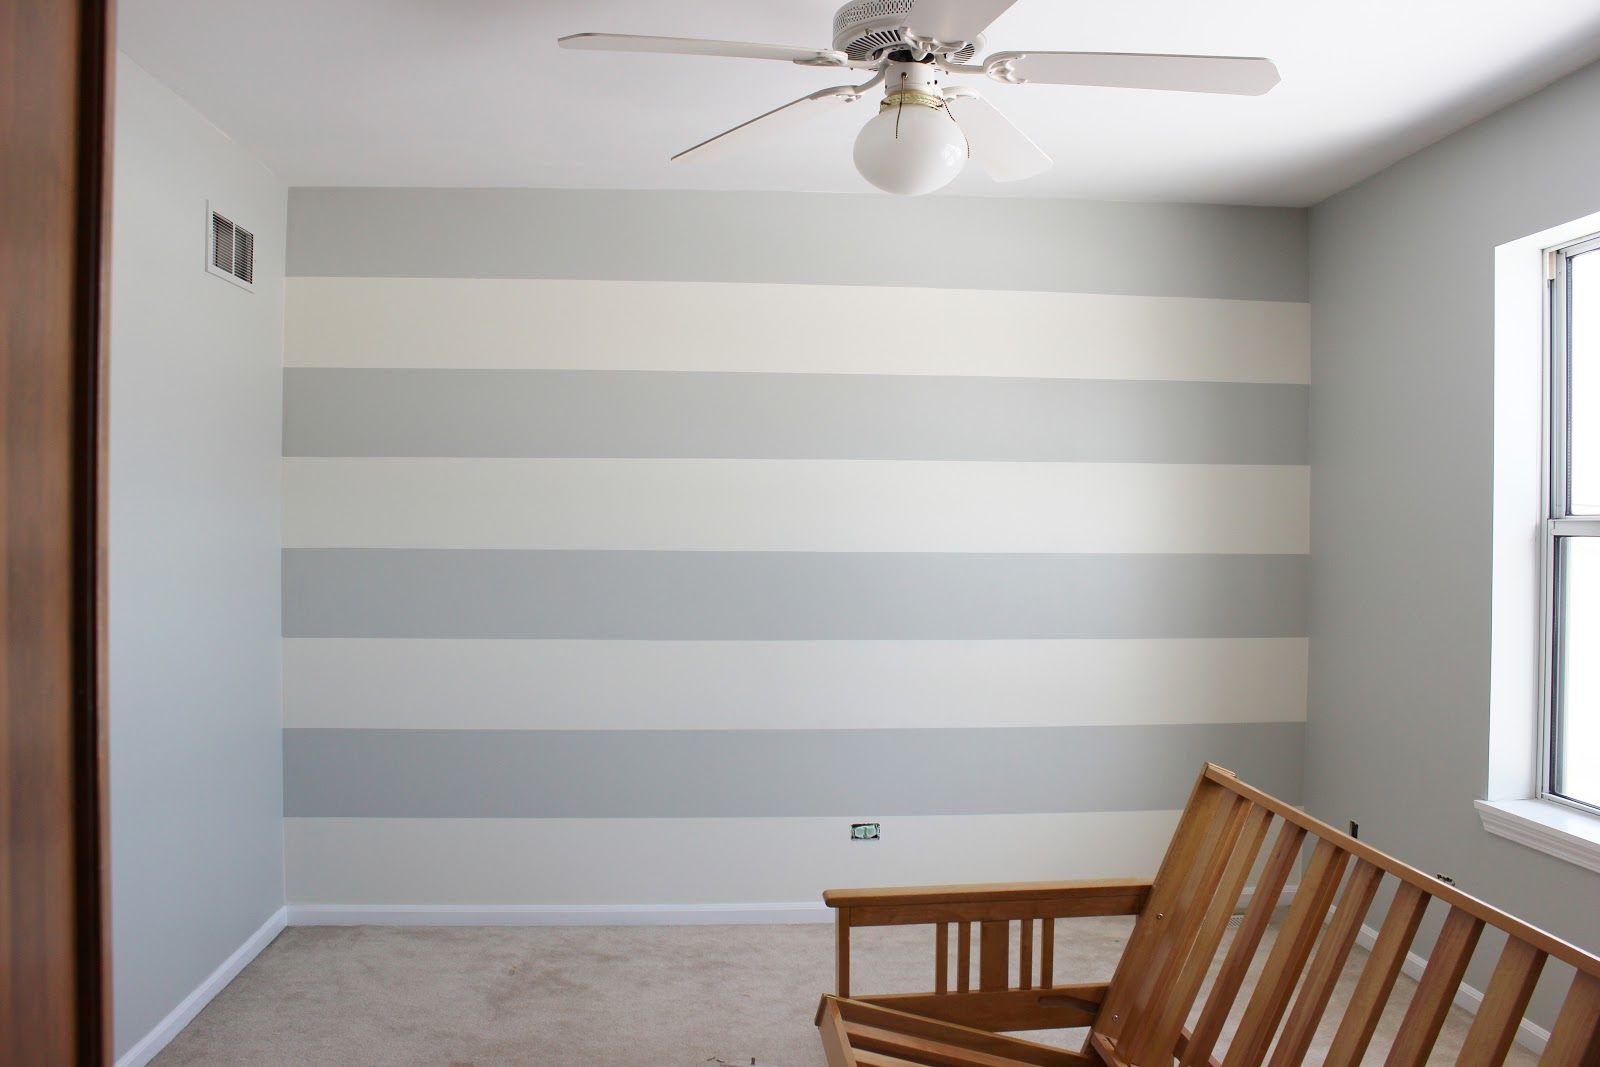 Baby B S Aqua Orange Nursery Starting The Makeover Striped Walls Gray Striped Walls Grey Striped Walls